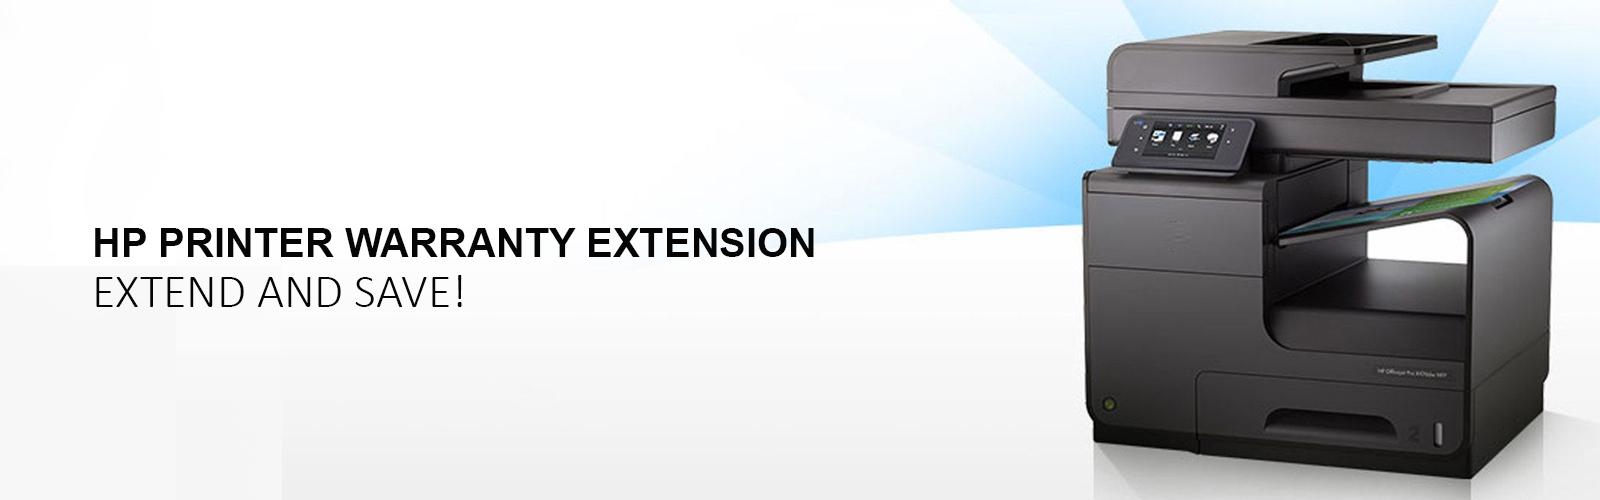 HP Printer Warranty Extension Delhi